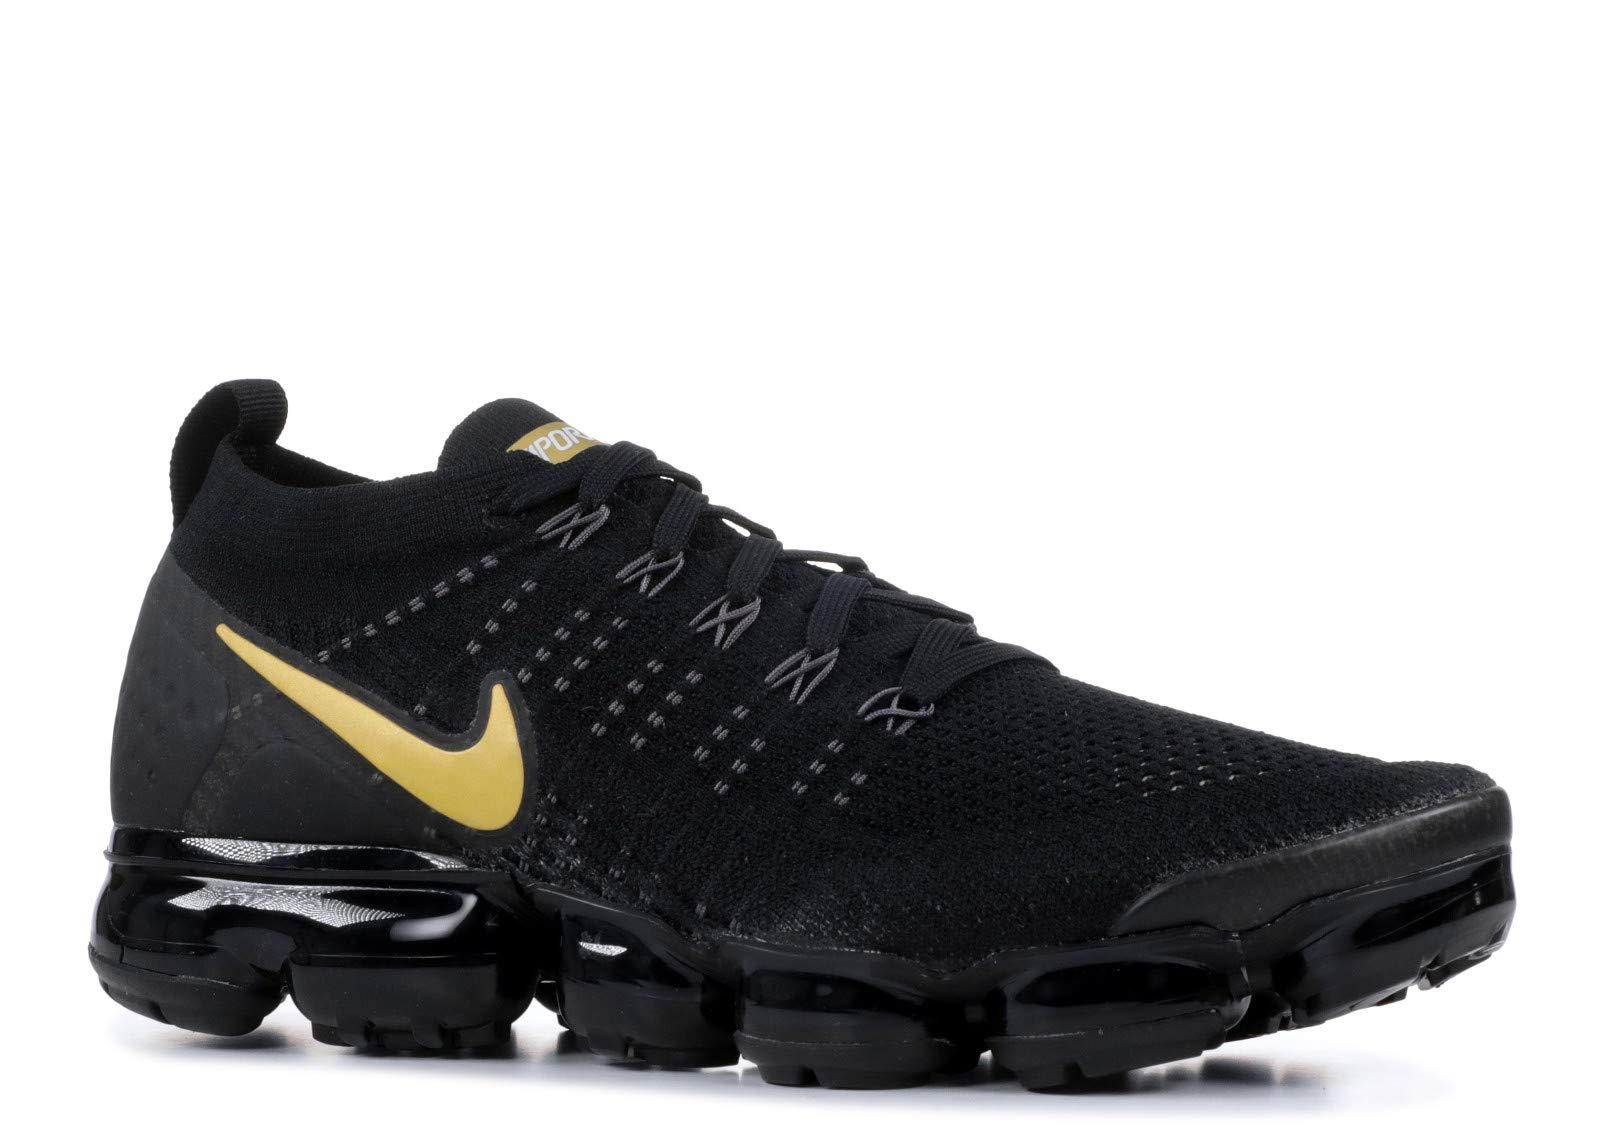 new product fe40d 5e6df Nike Women's Air Vapormax Flyknit 2 Running Shoes (7, Black/Gold)